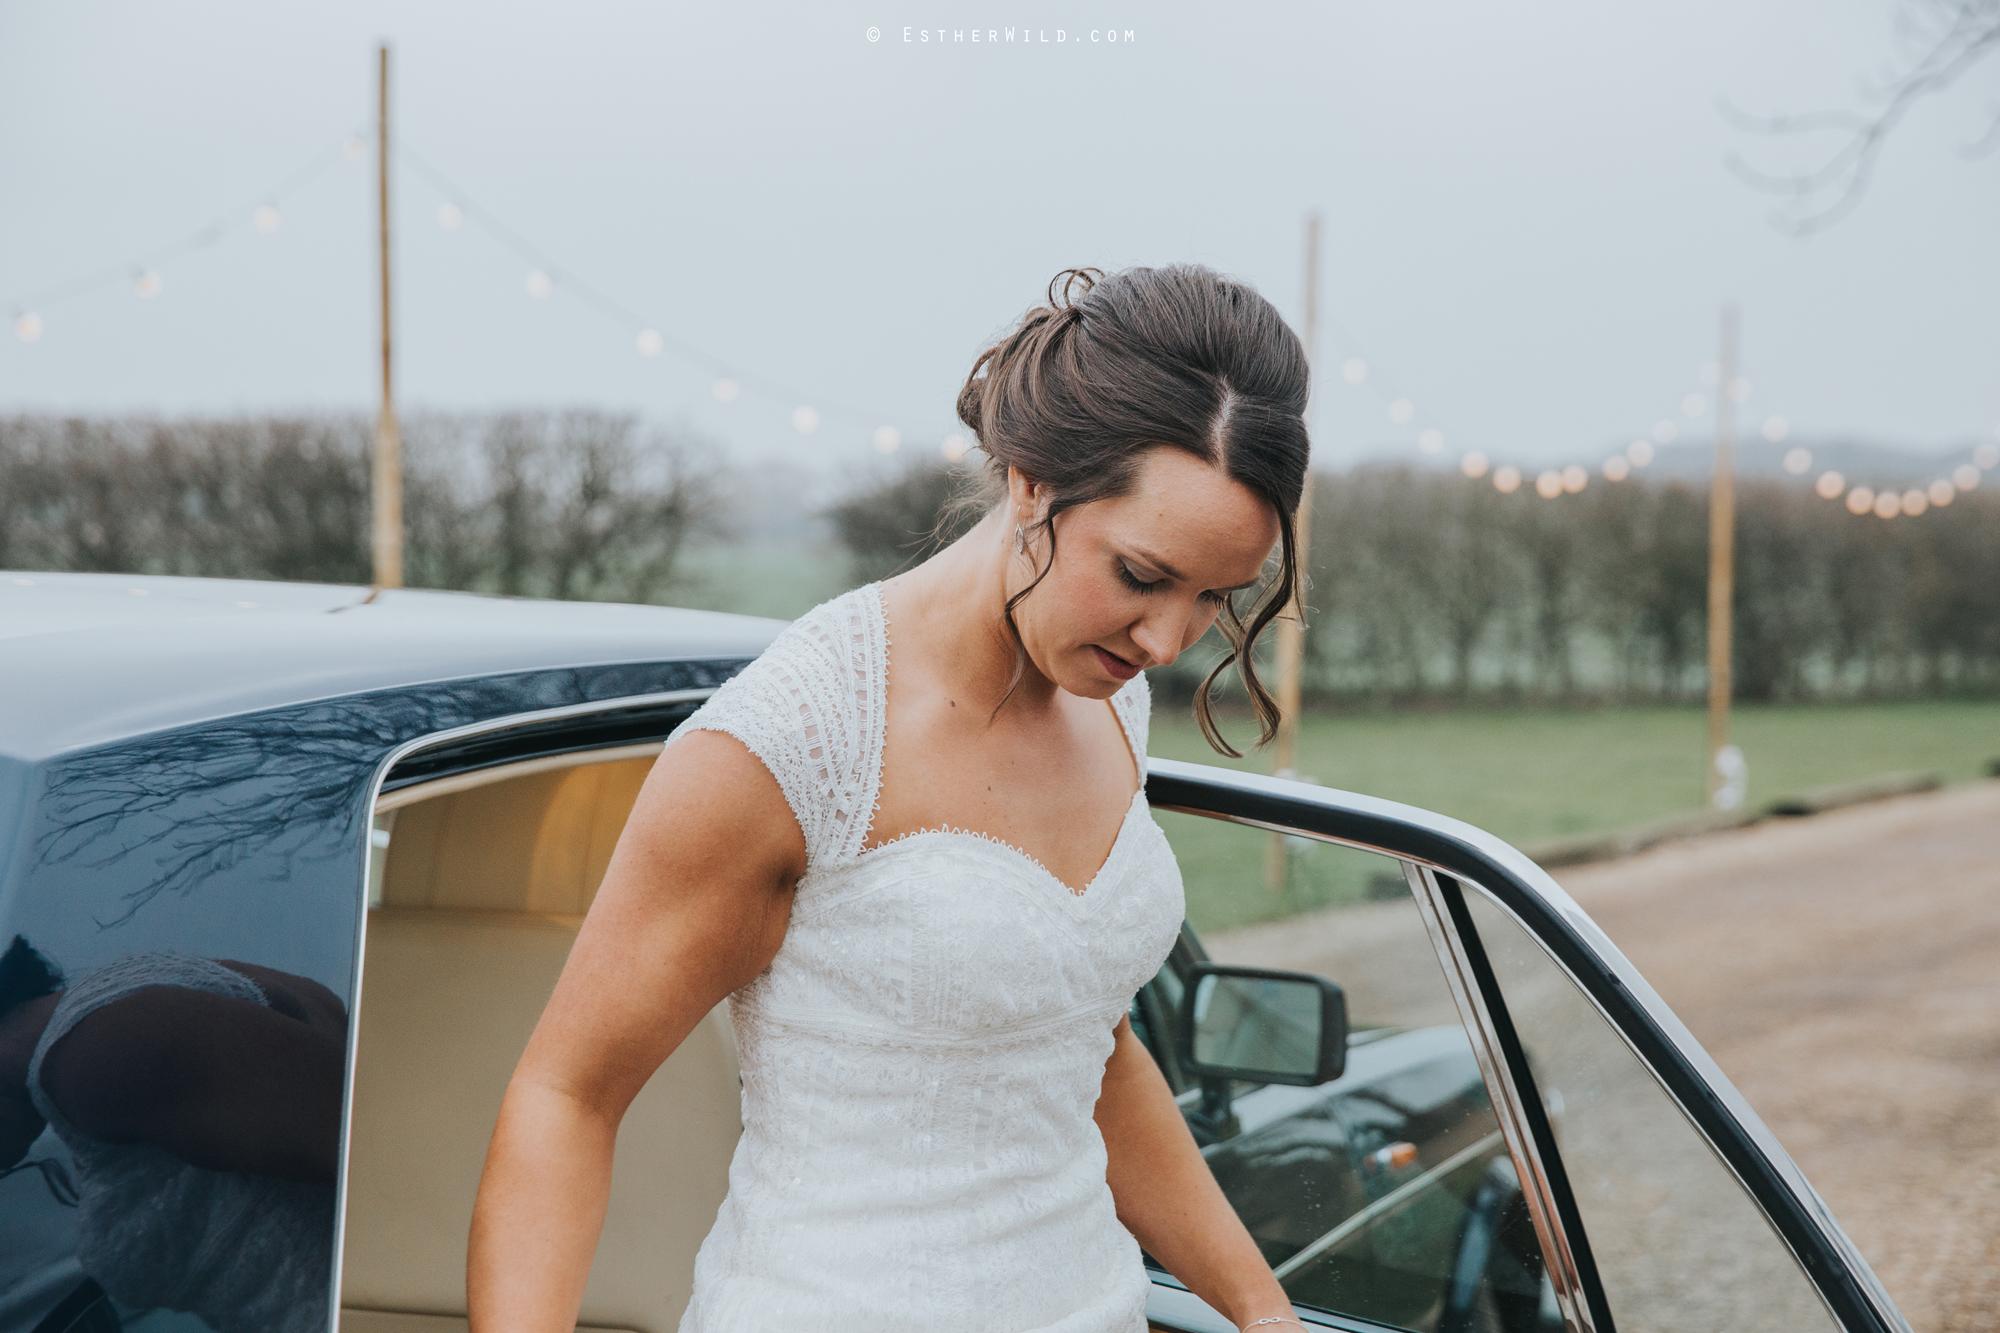 Elms_Barn_Weddings_Suffolk_Photographer_Copyright_Esther_Wild_IMG_1025.jpg